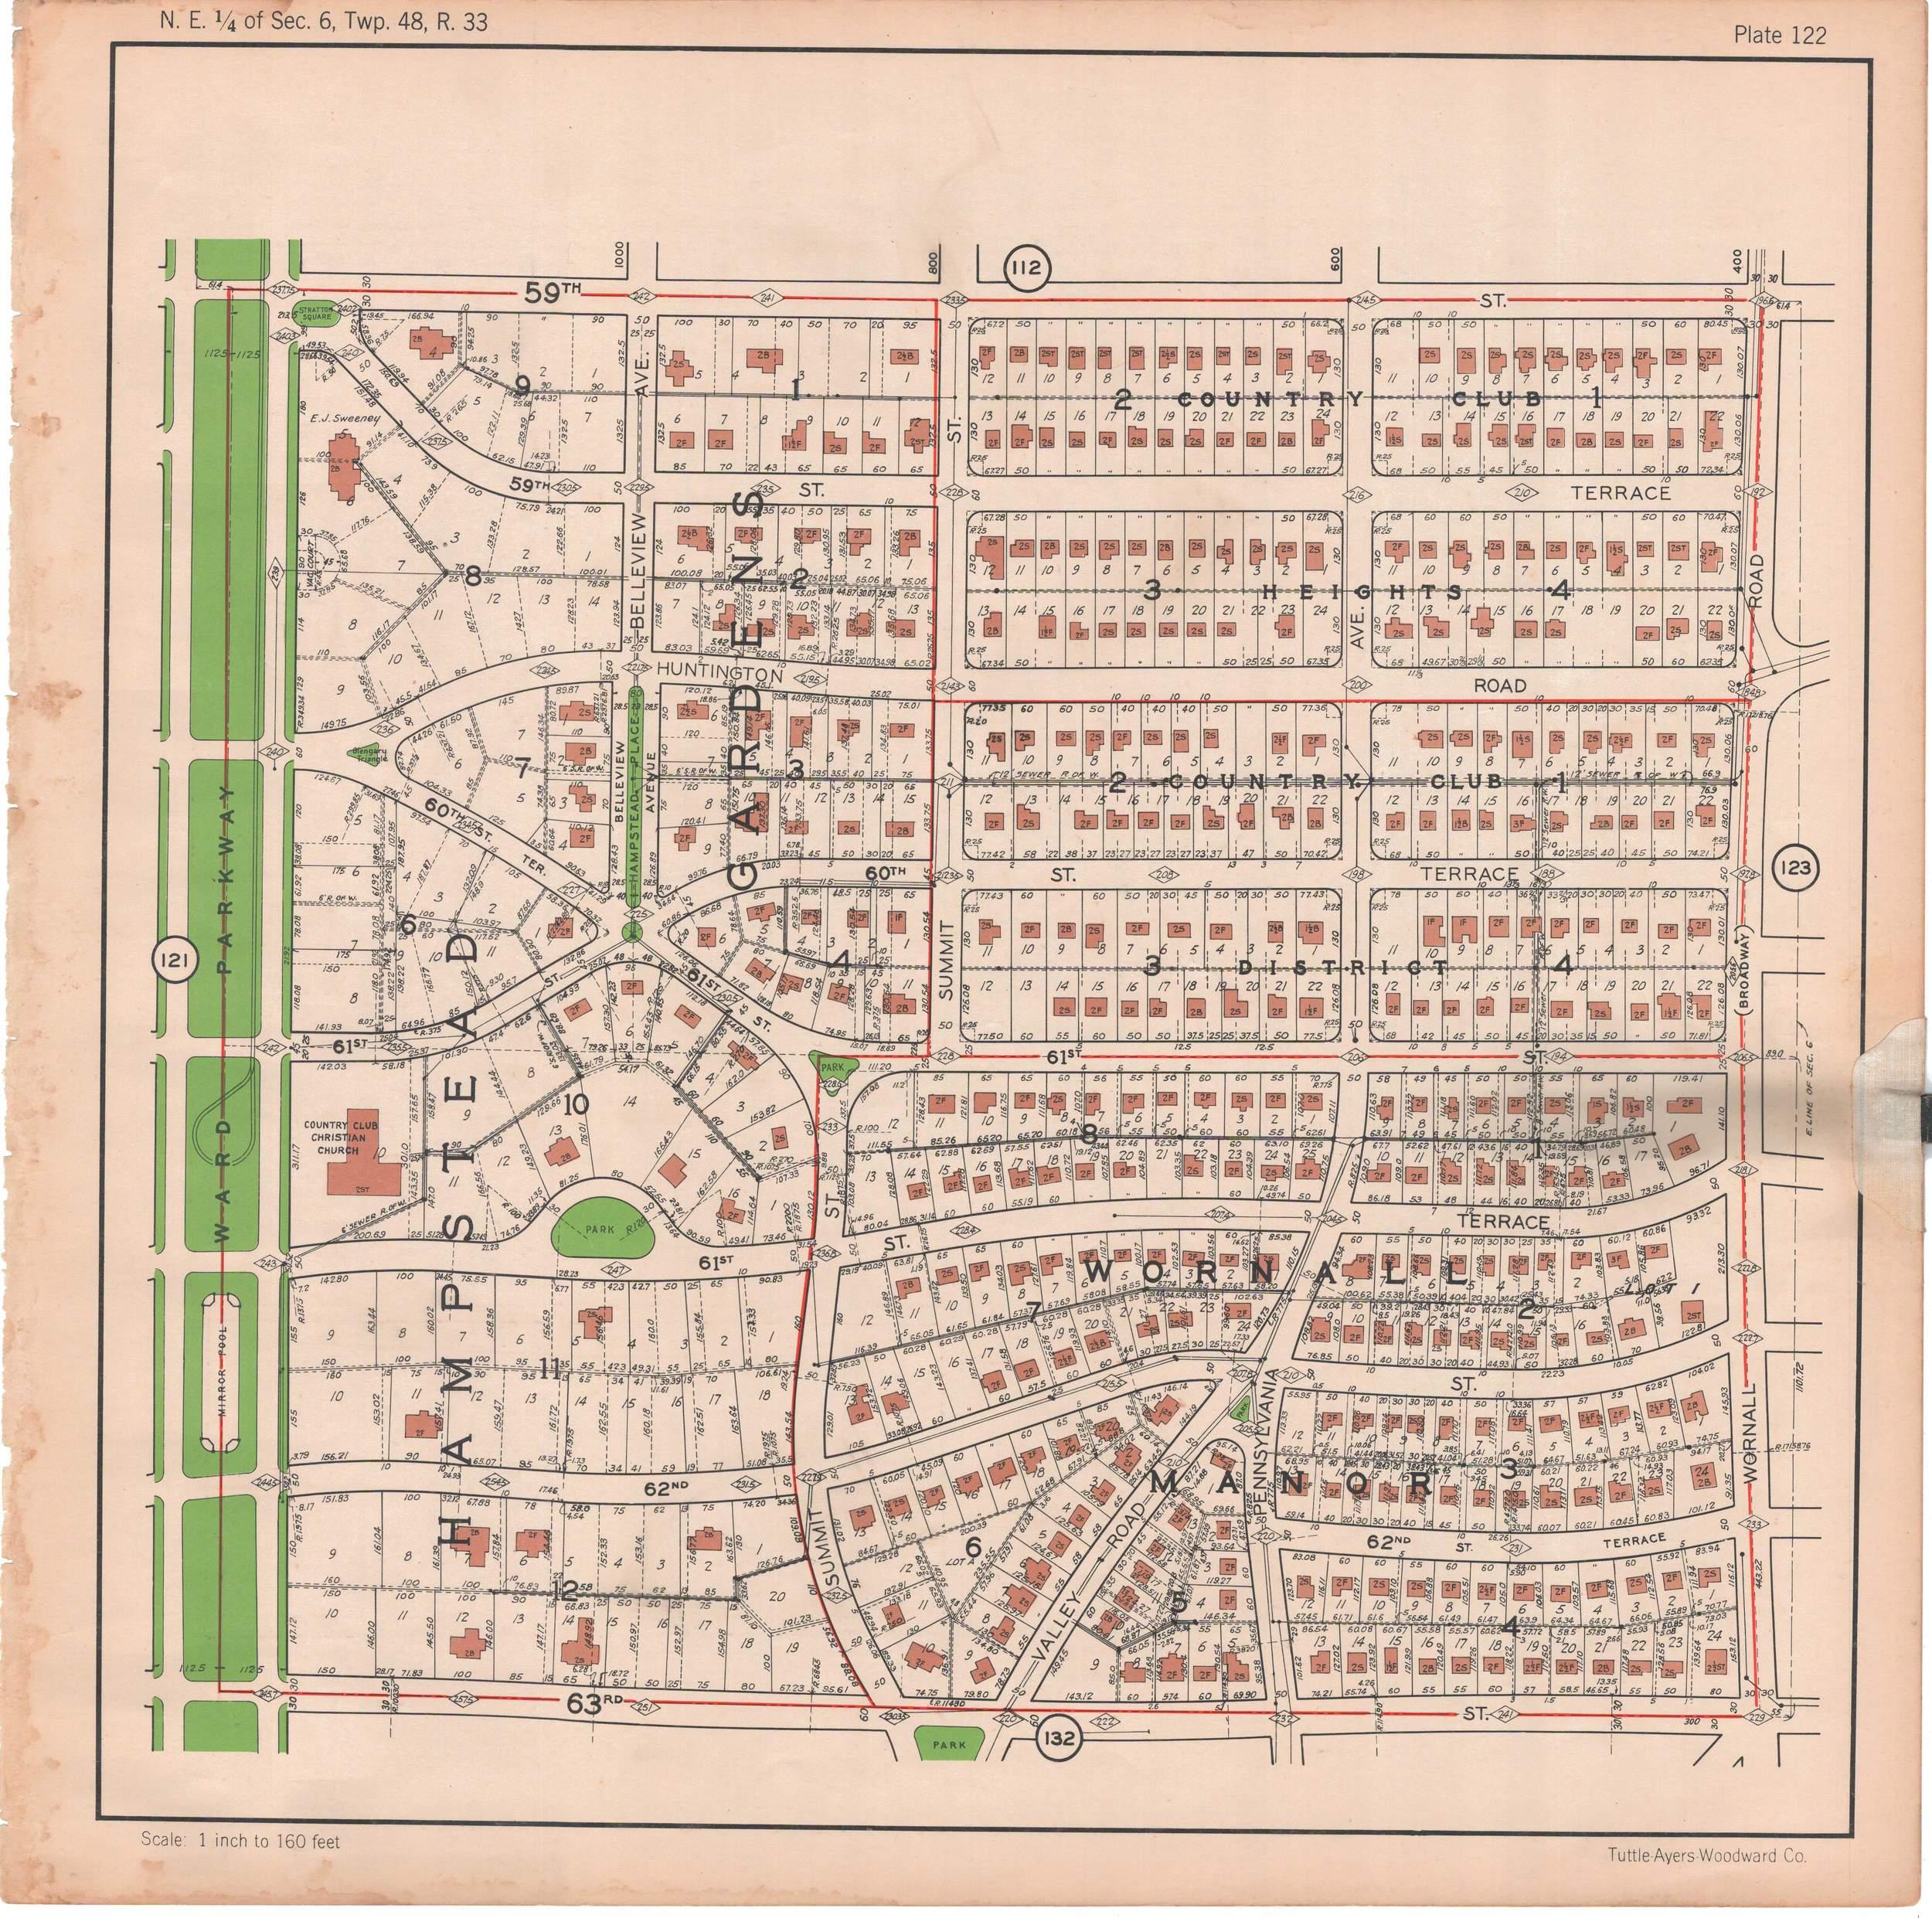 1925 TUTTLE_AYERS_Plate 122.JPG